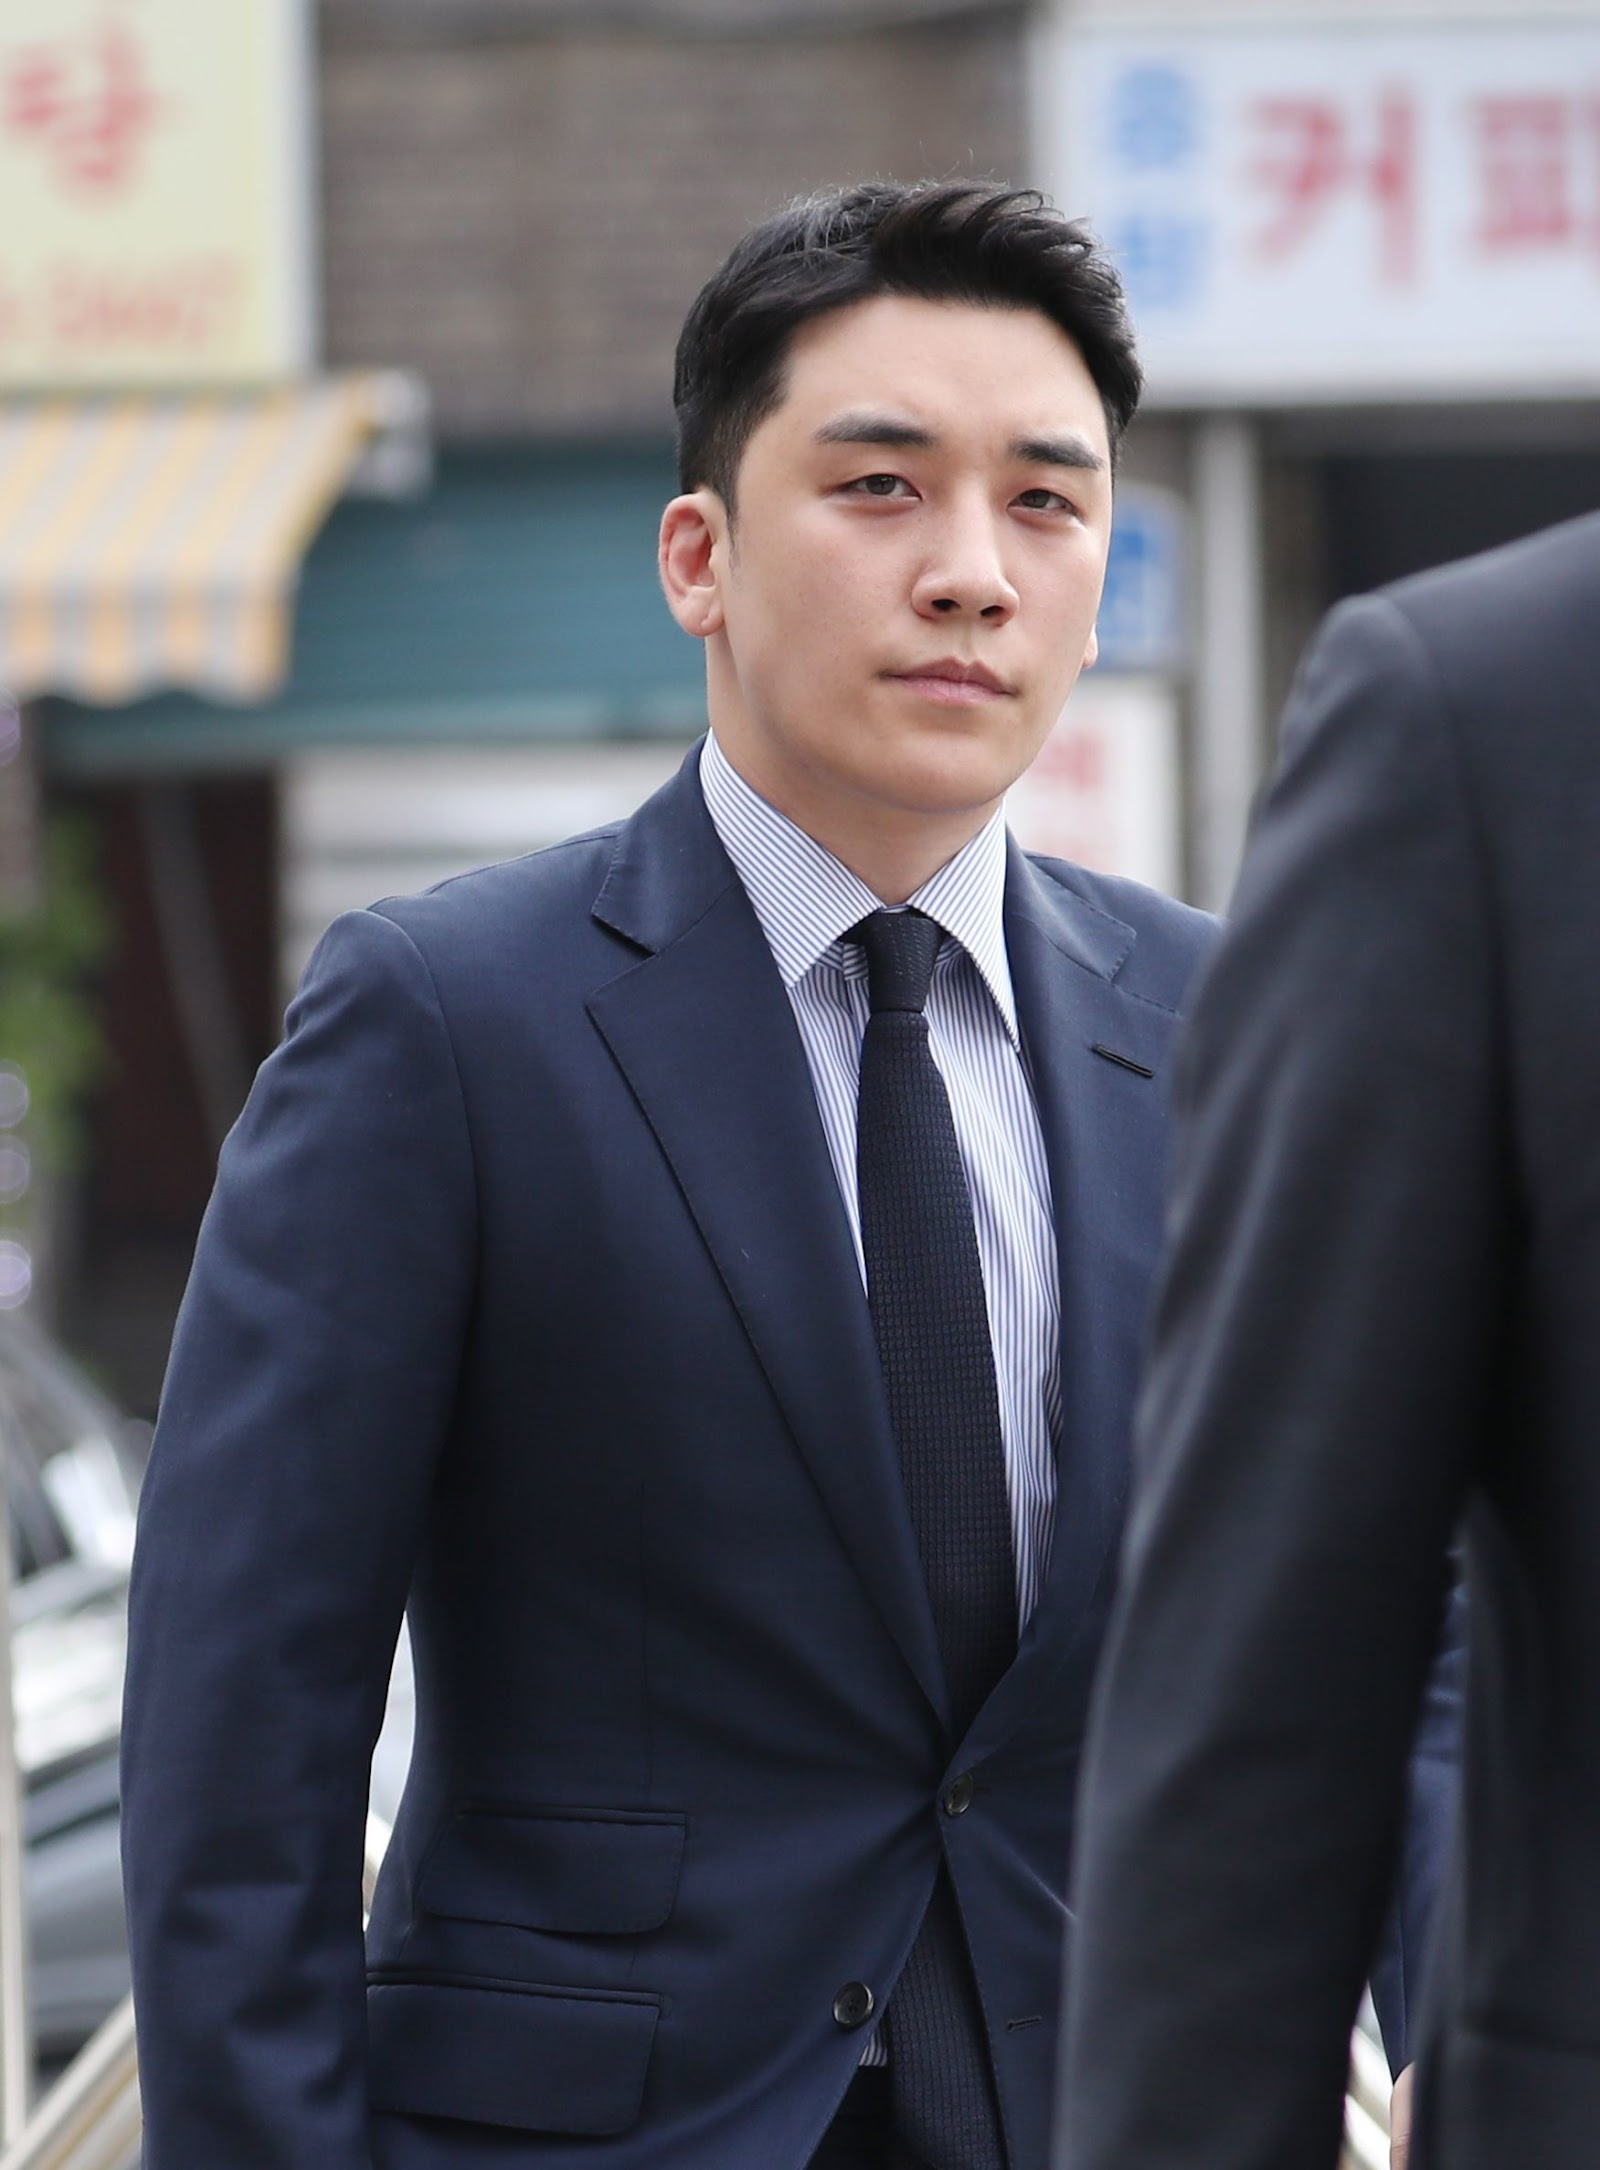 seungri enlist march 1